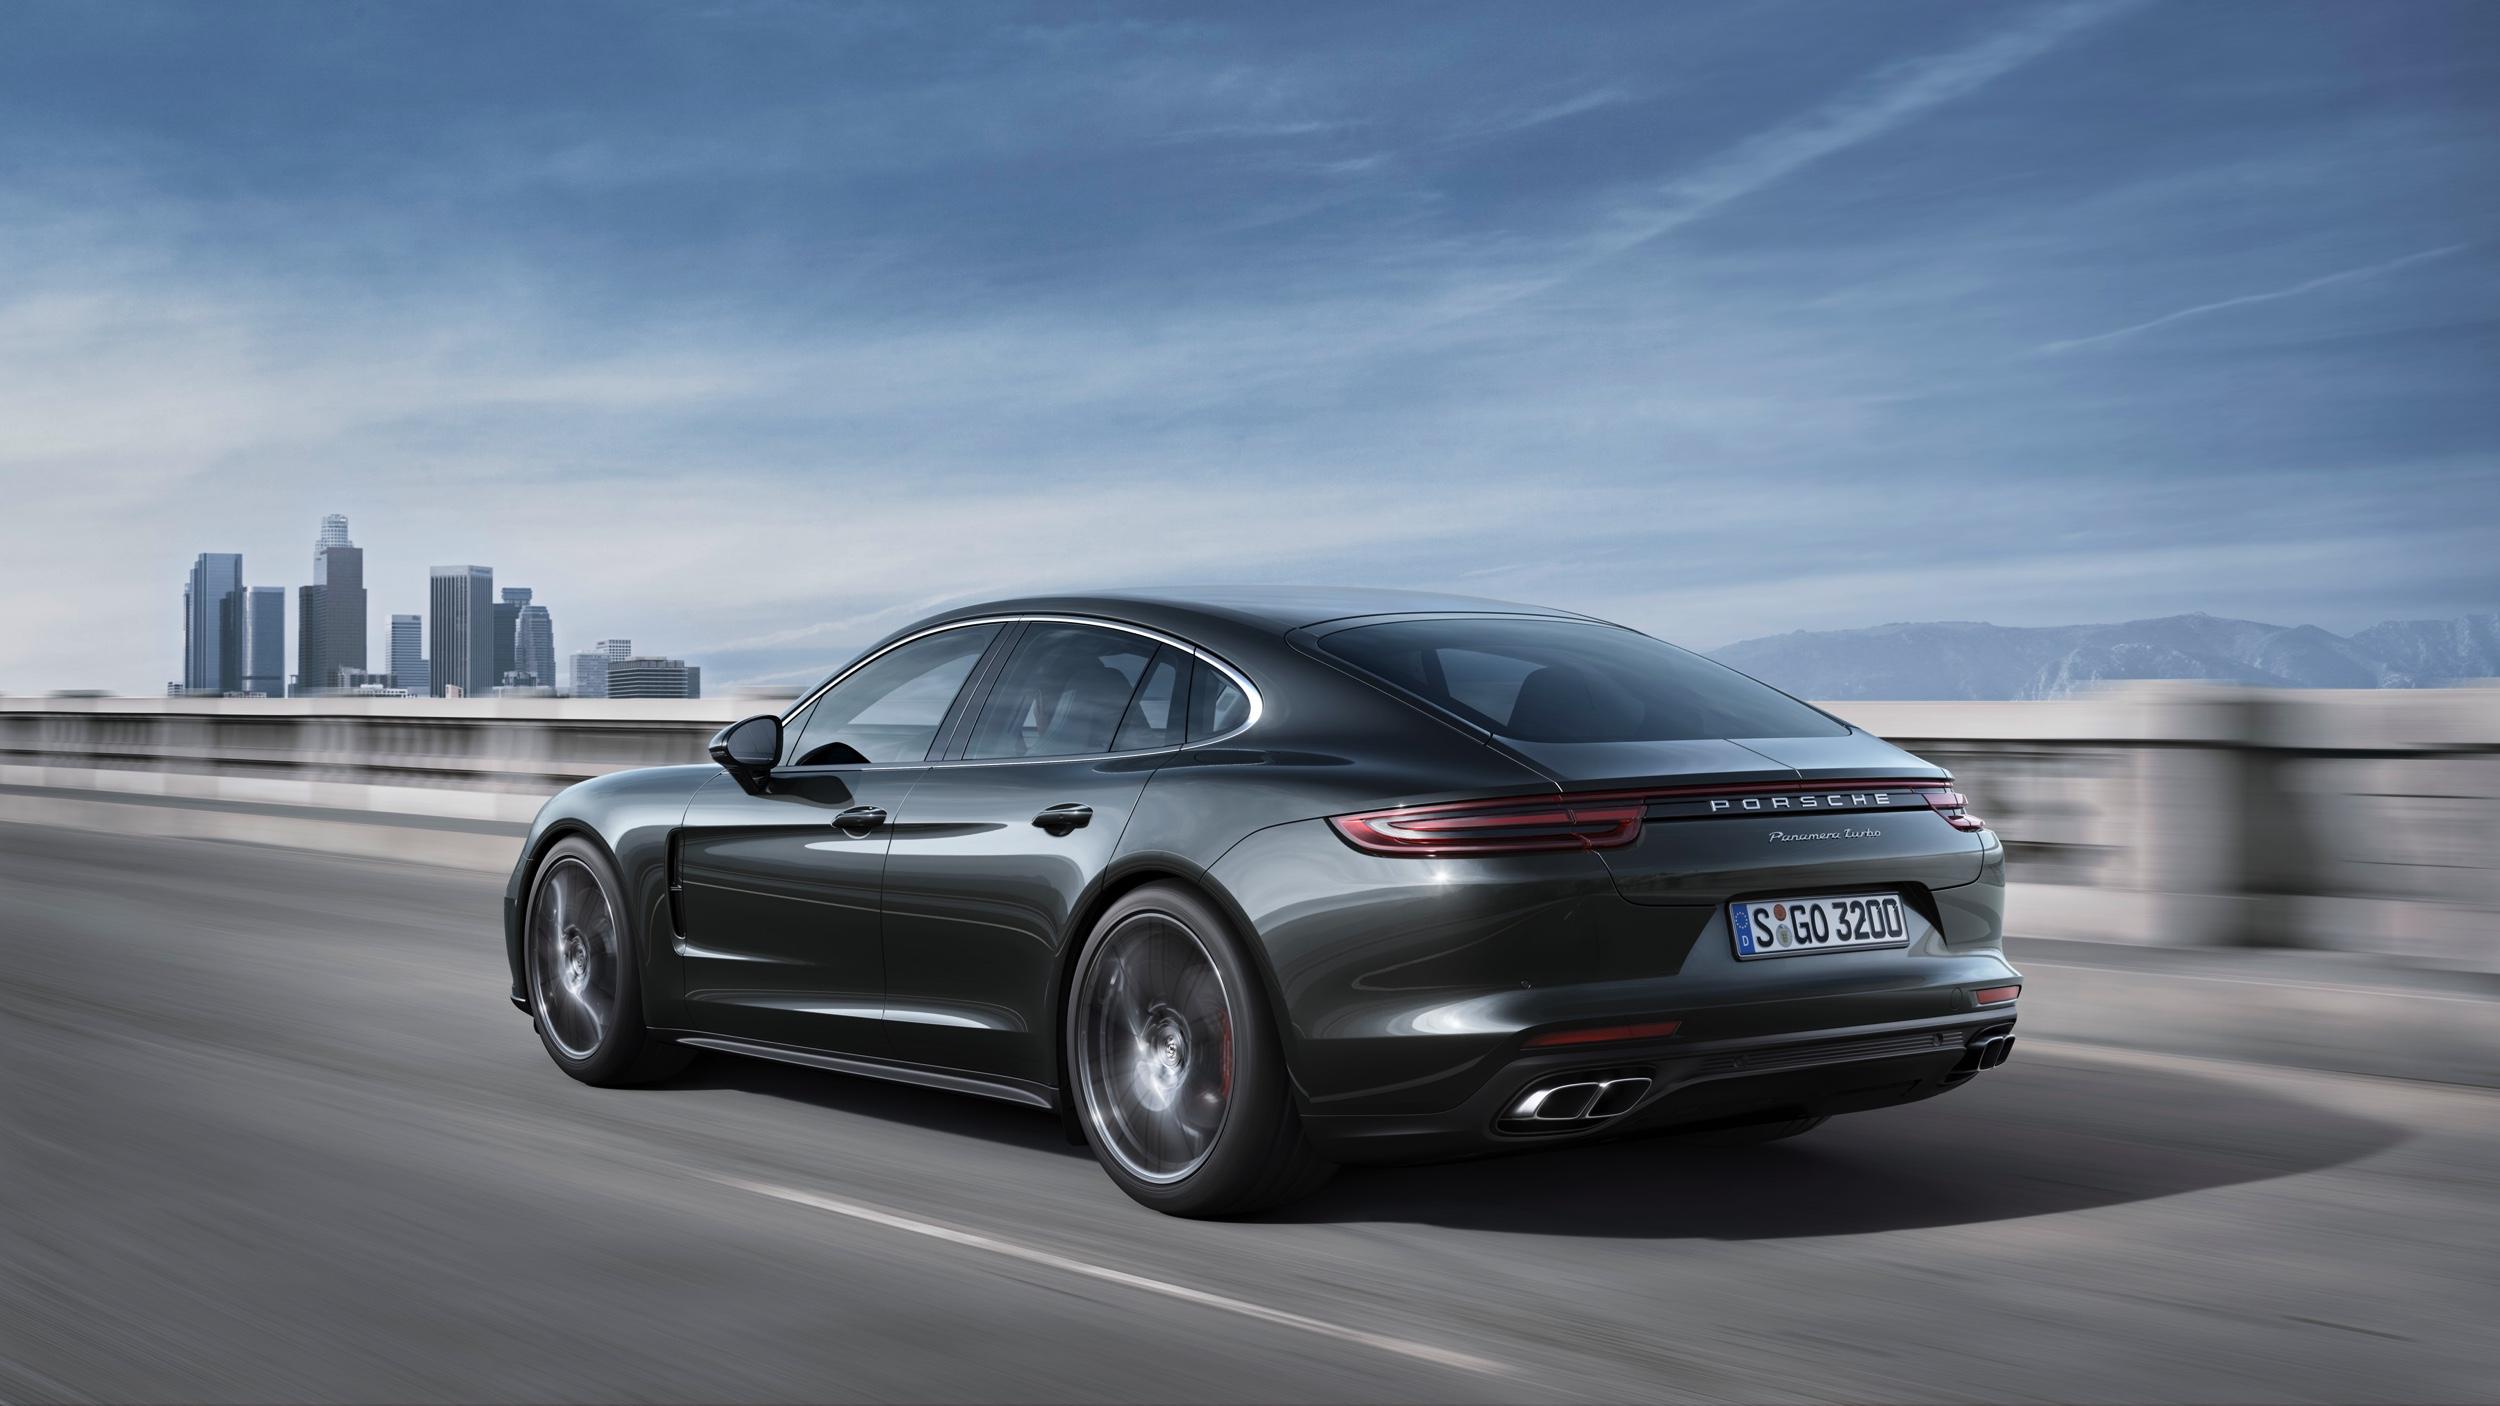 Porsche Panamera - Autovisie.nl - 3